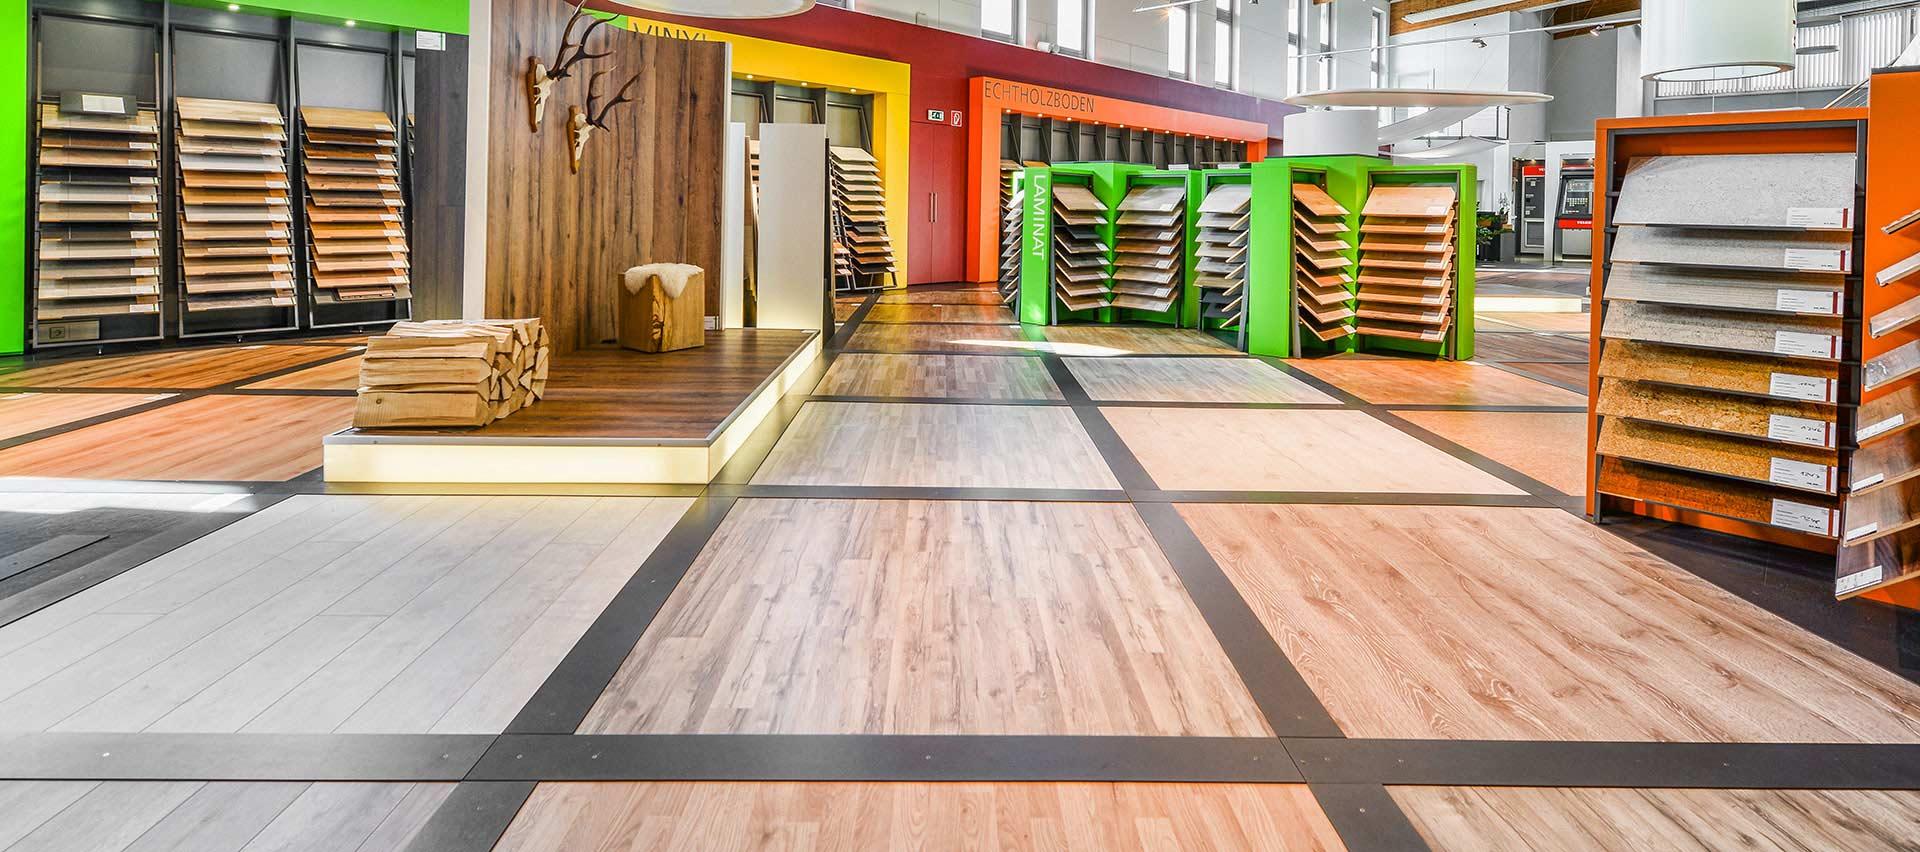 toom pvc boden best with toom pvc boden affordable pvc vloeren oss elegant best pvc vloeren. Black Bedroom Furniture Sets. Home Design Ideas